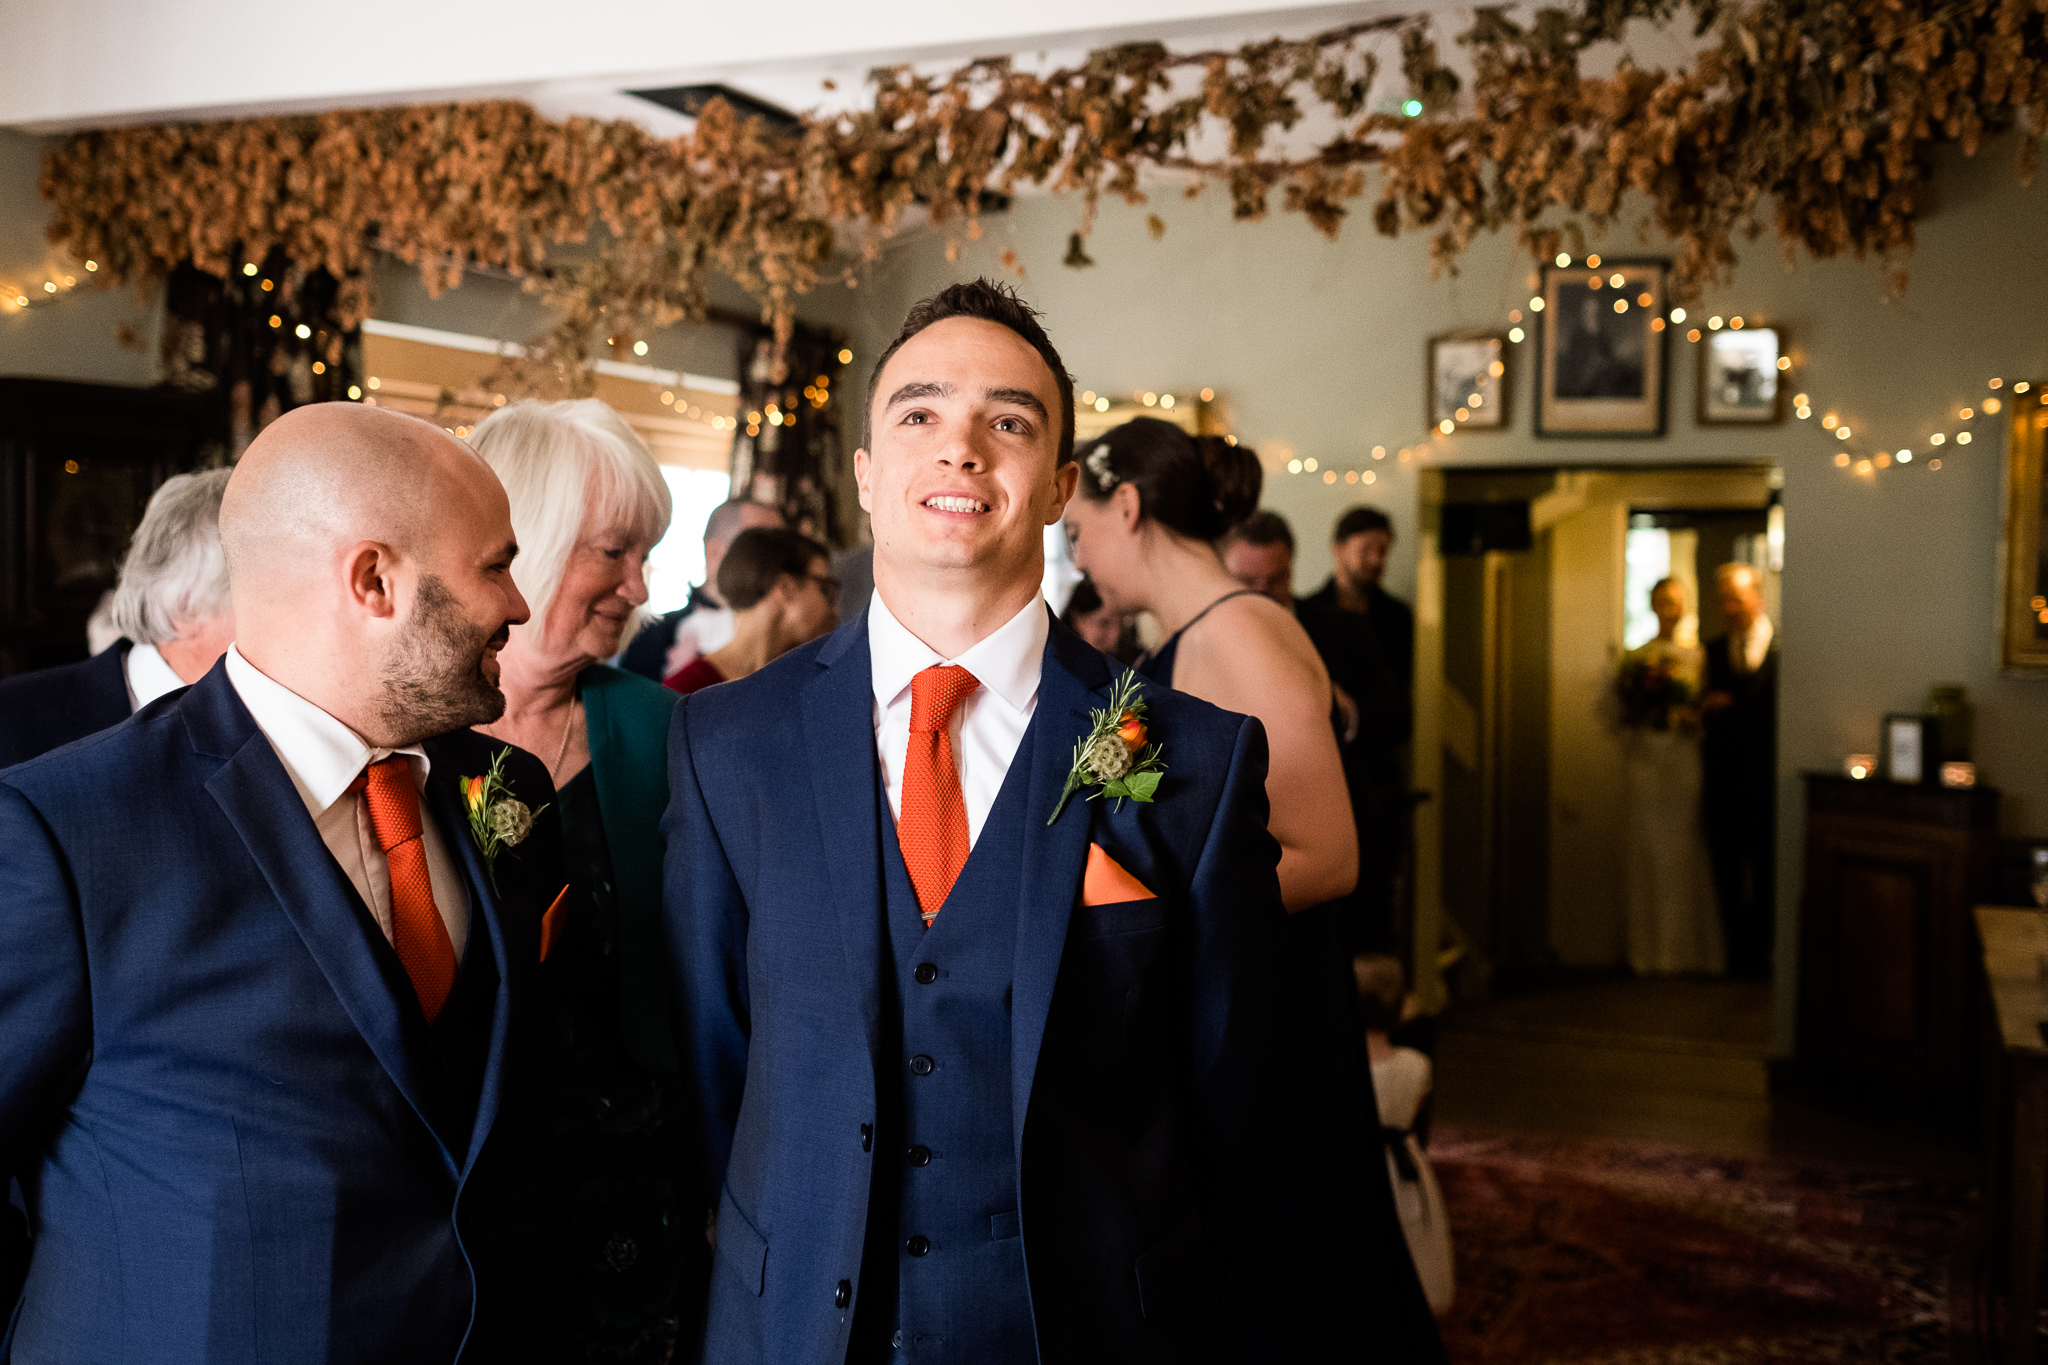 Relaxed Documentary Wedding Photography at The Wizard Inn, Alderley Edge Cheshire - Jenny Harper-19.jpg